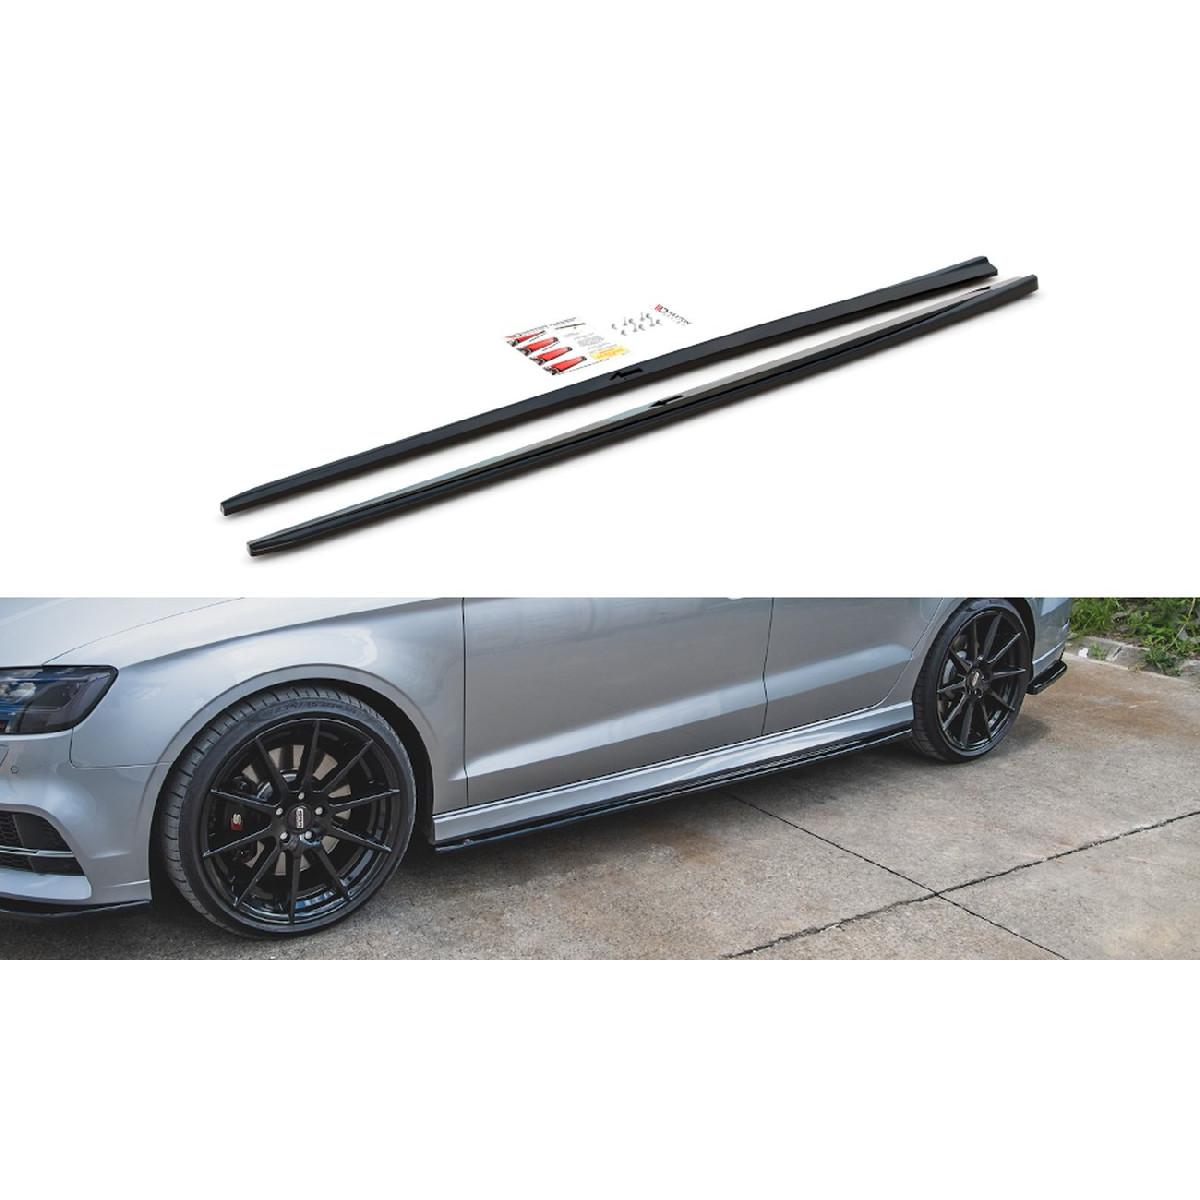 Seitenschweller Ansatz Cup Leisten V.2 für Audi S3 / A3 S-Line Limousine 8V Facelift schwarz matt